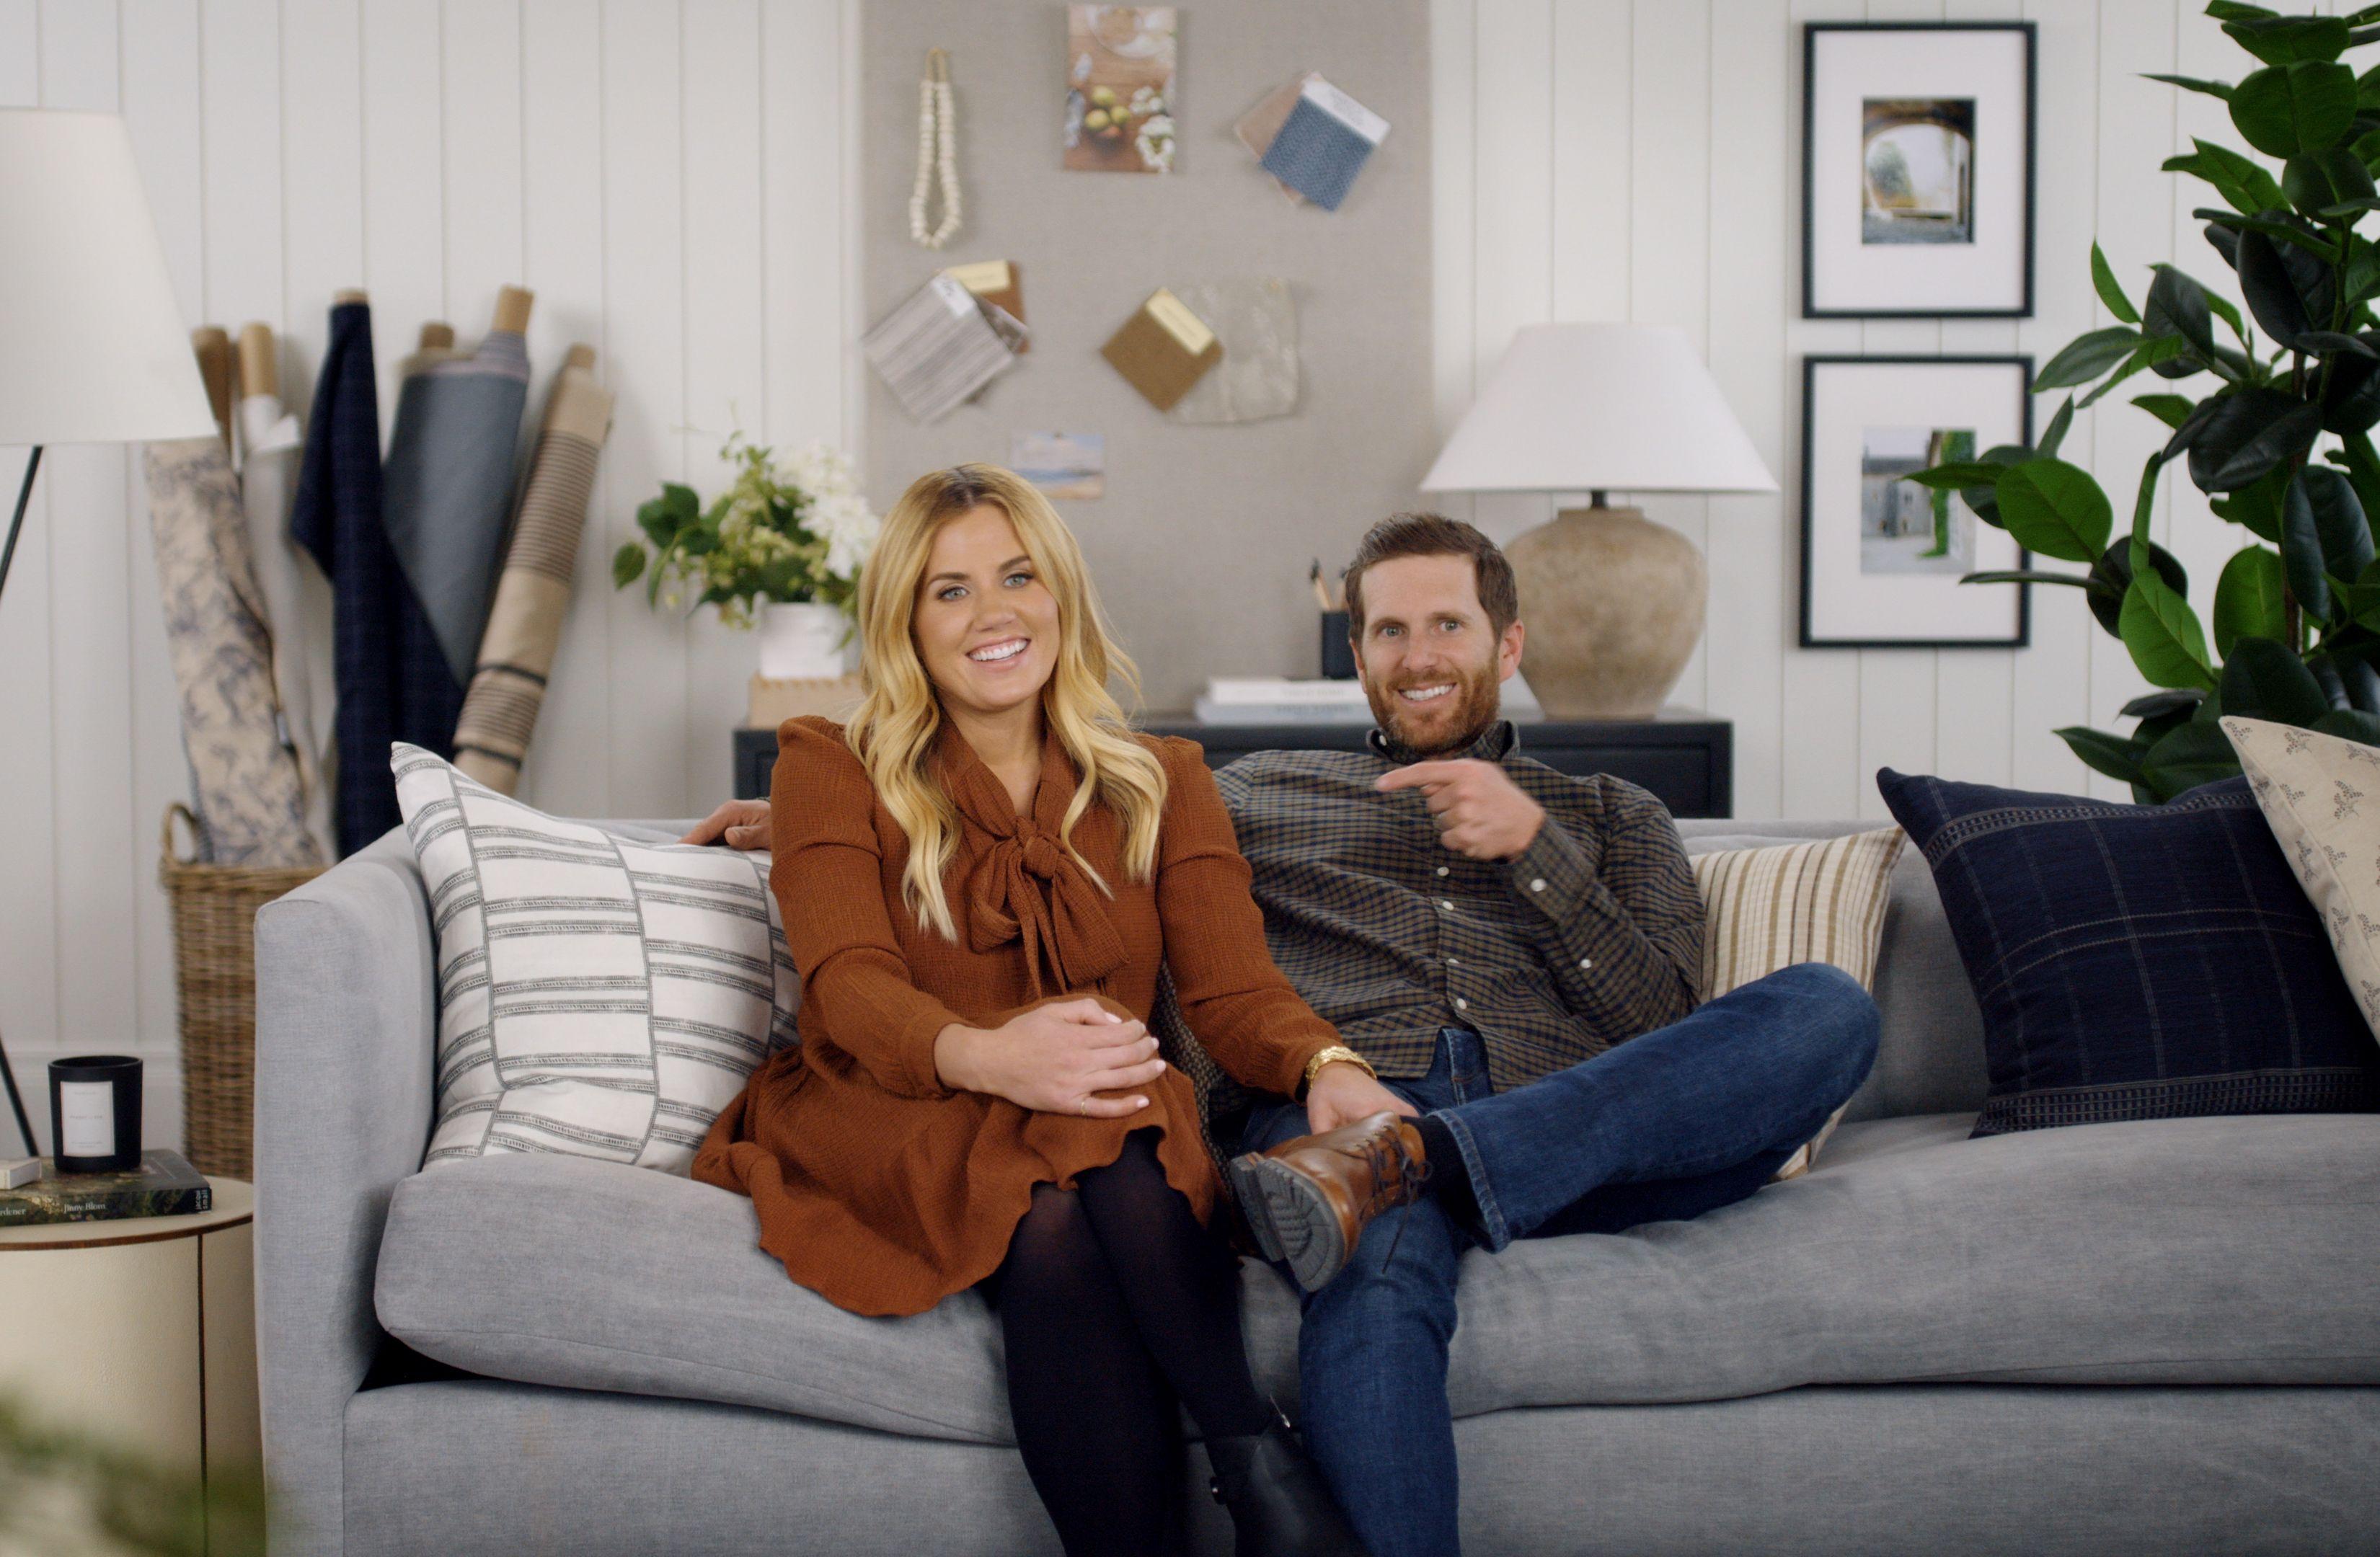 Meet Studio McGee: The Stars of Netflix's 'Dream Home Makeover'